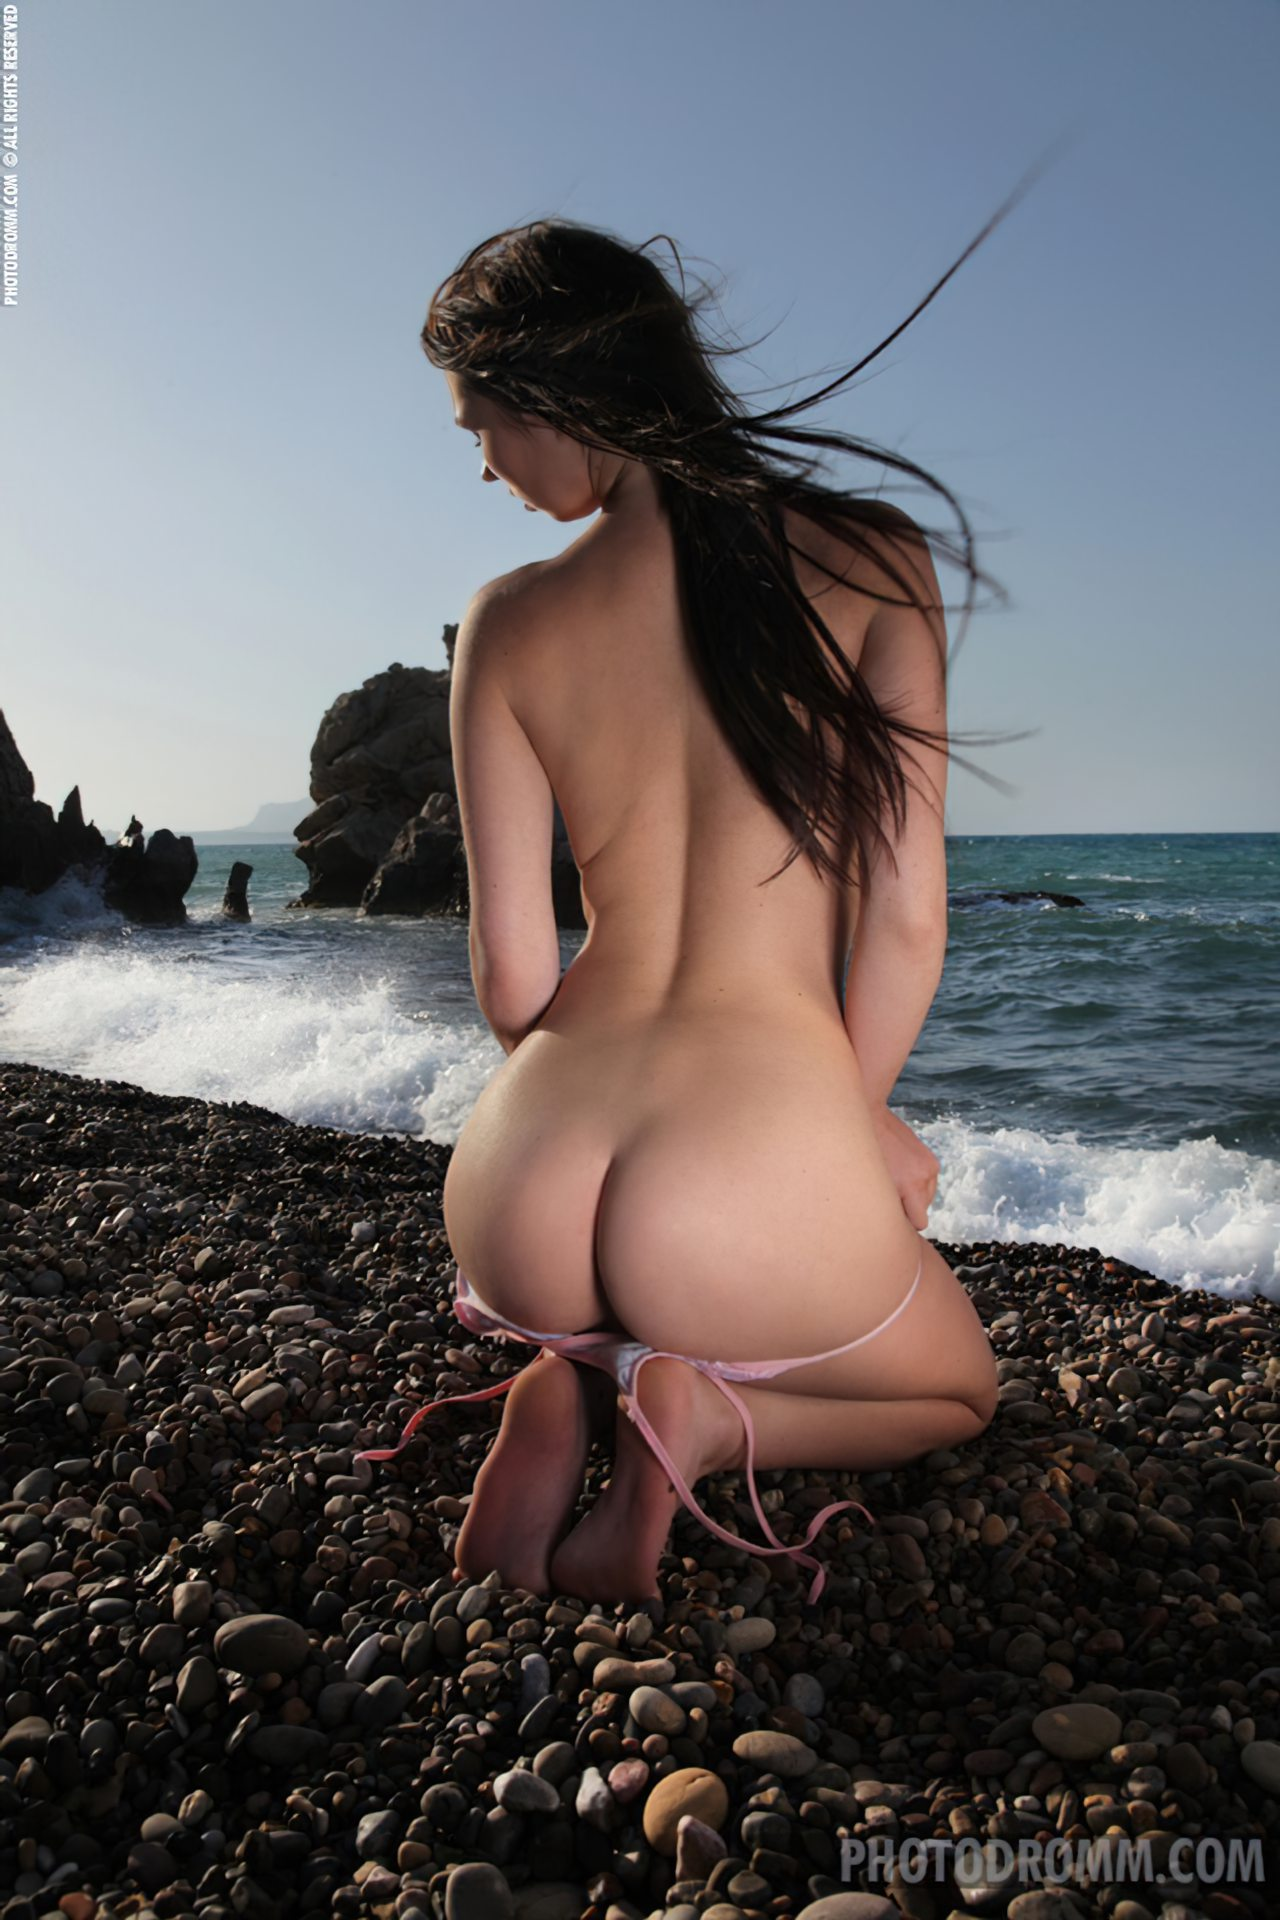 Mulher Nua Praia (5)